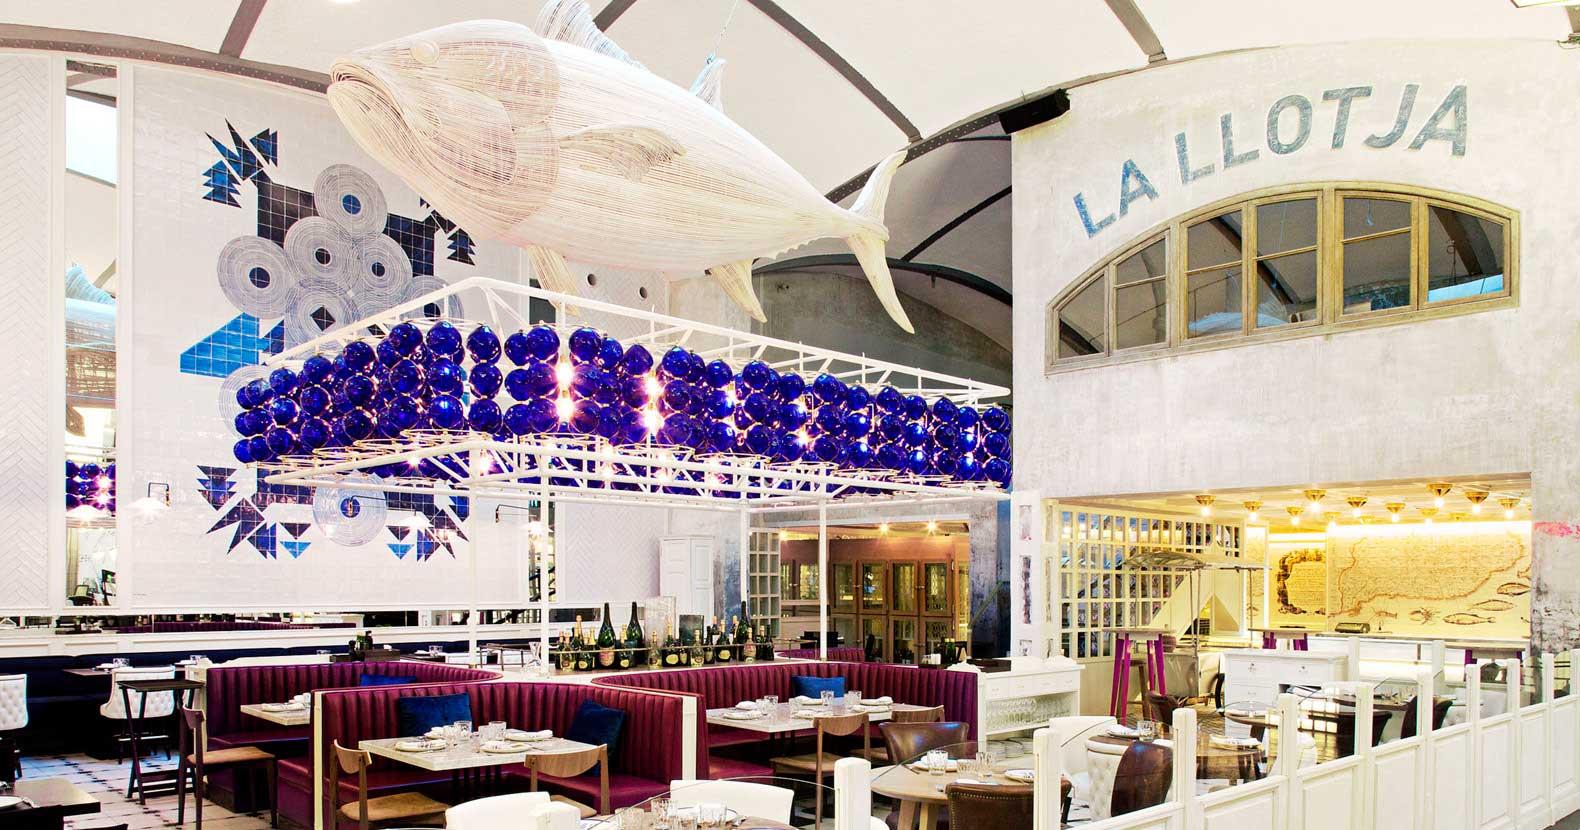 El_Nacional_Barcelona_restaurante_multidisciplinar_bar_14